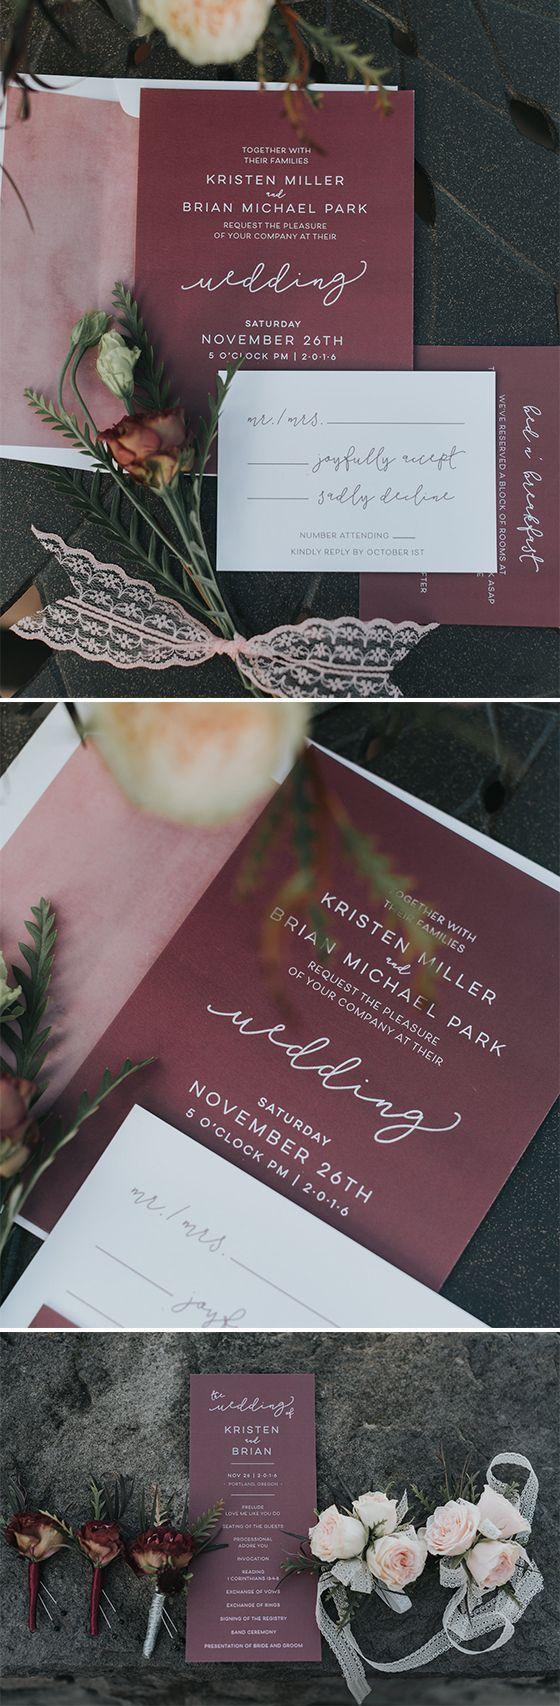 Romantic burgundy and pink wedding invitation suite